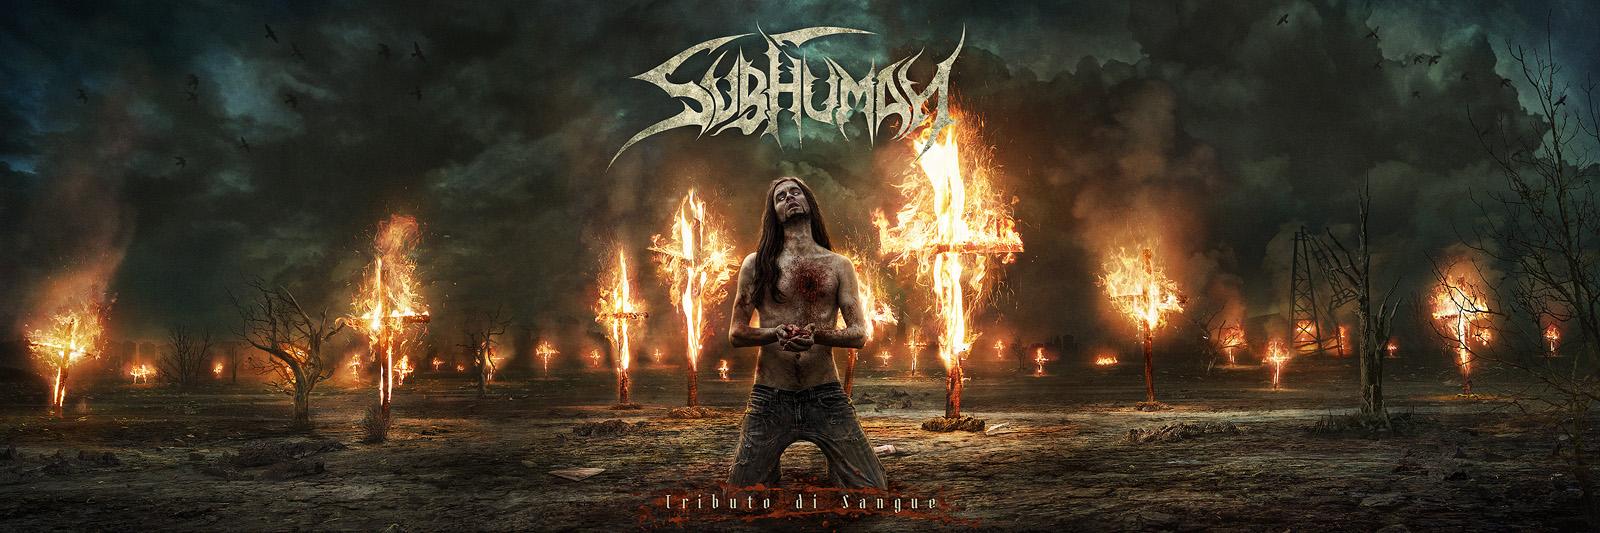 Subhuman artwork by isisdesignstudio